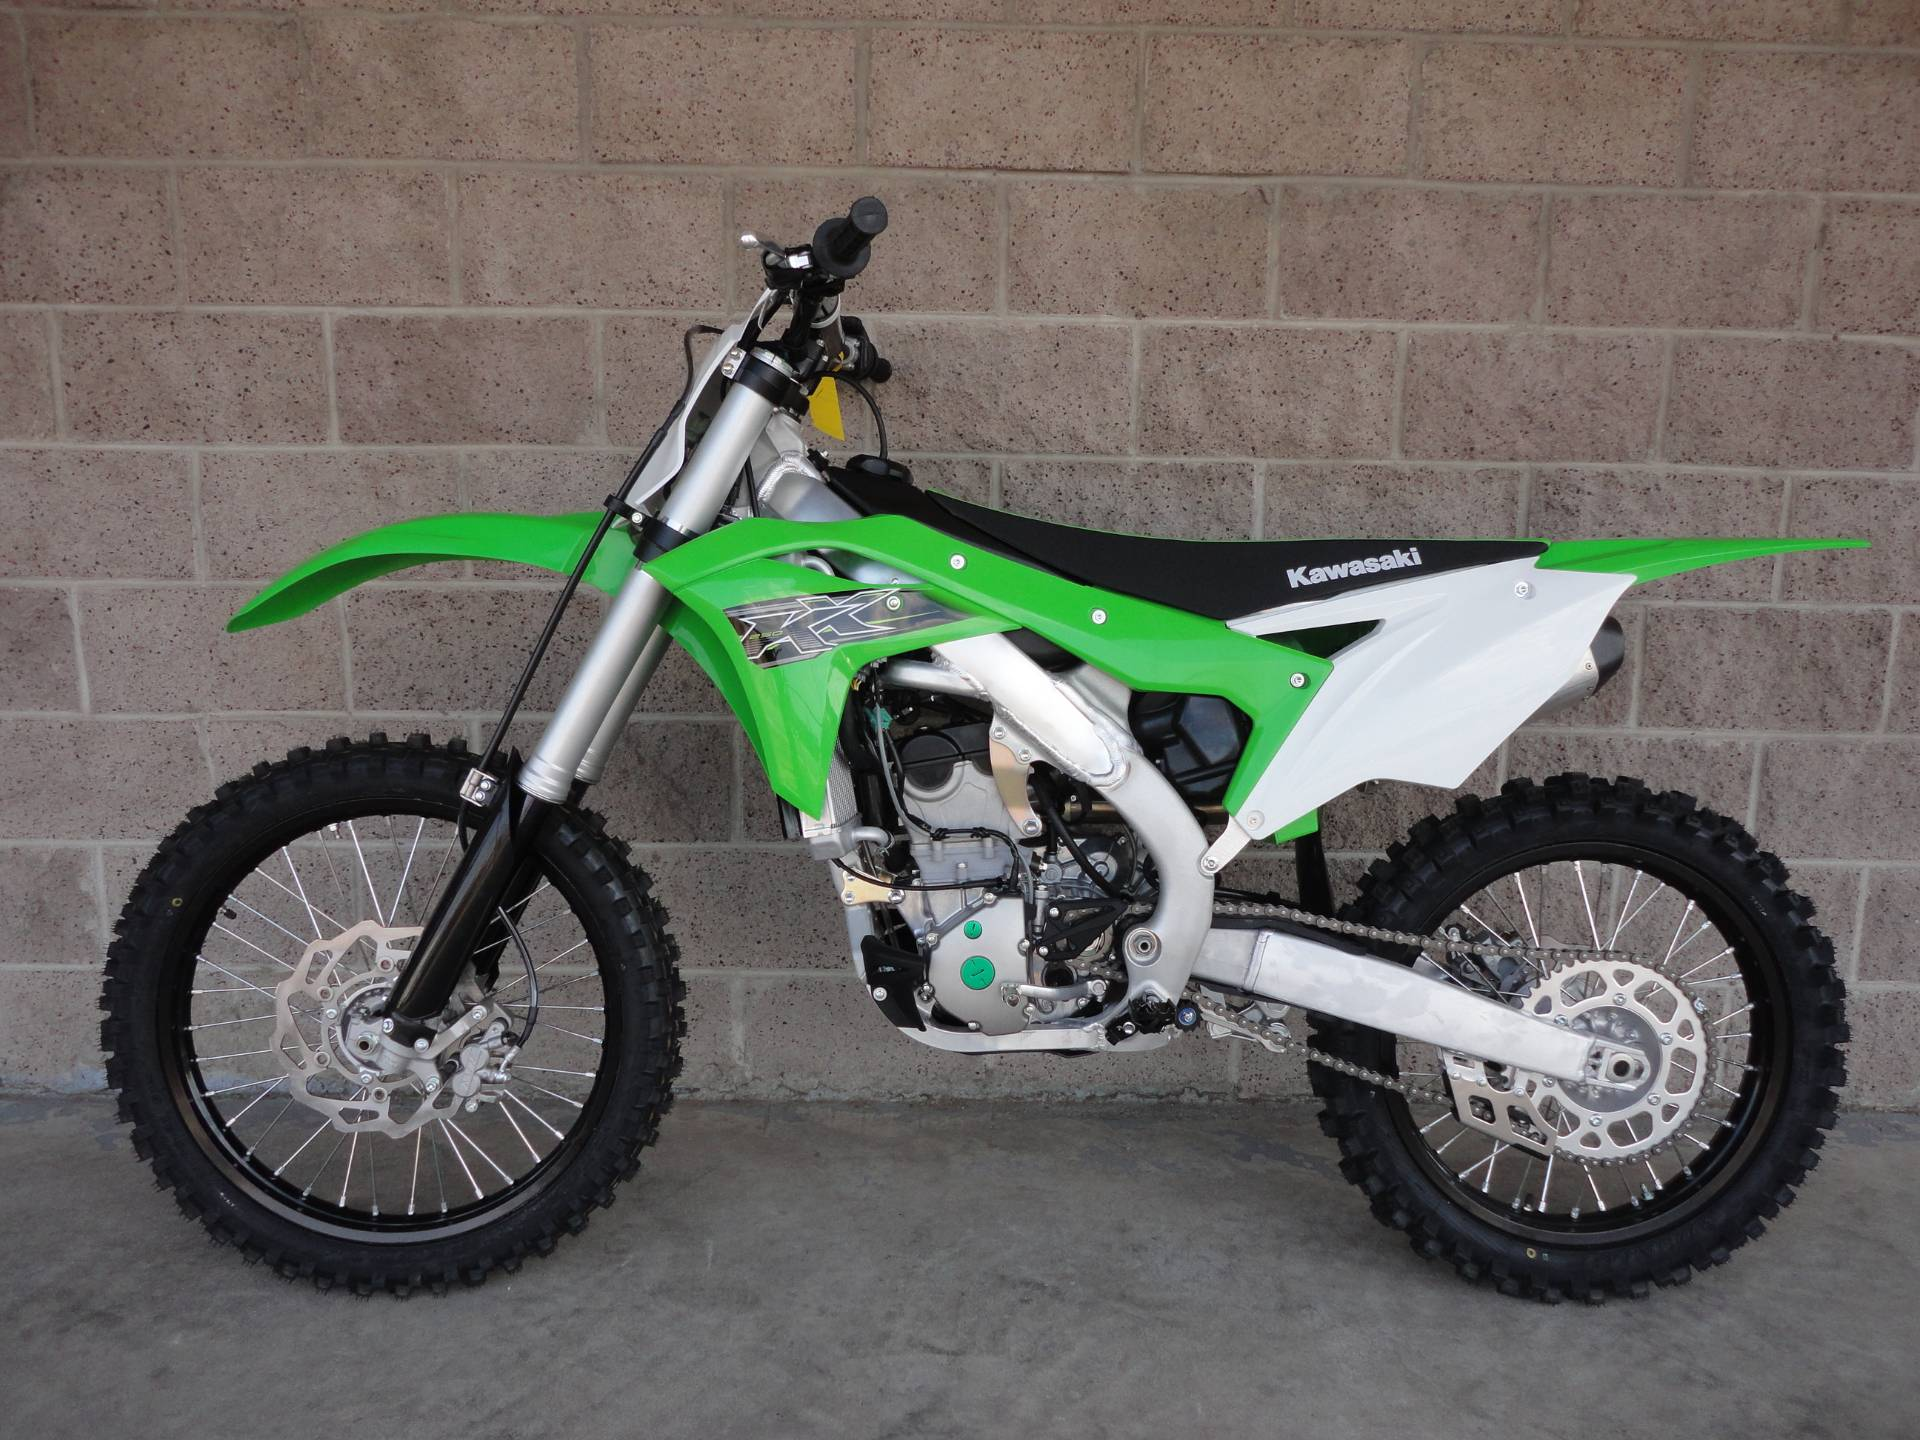 2019 Kawasaki Kx 250 Motorcycles Denver Colorado V0251 Kx250 Wiring Harness In